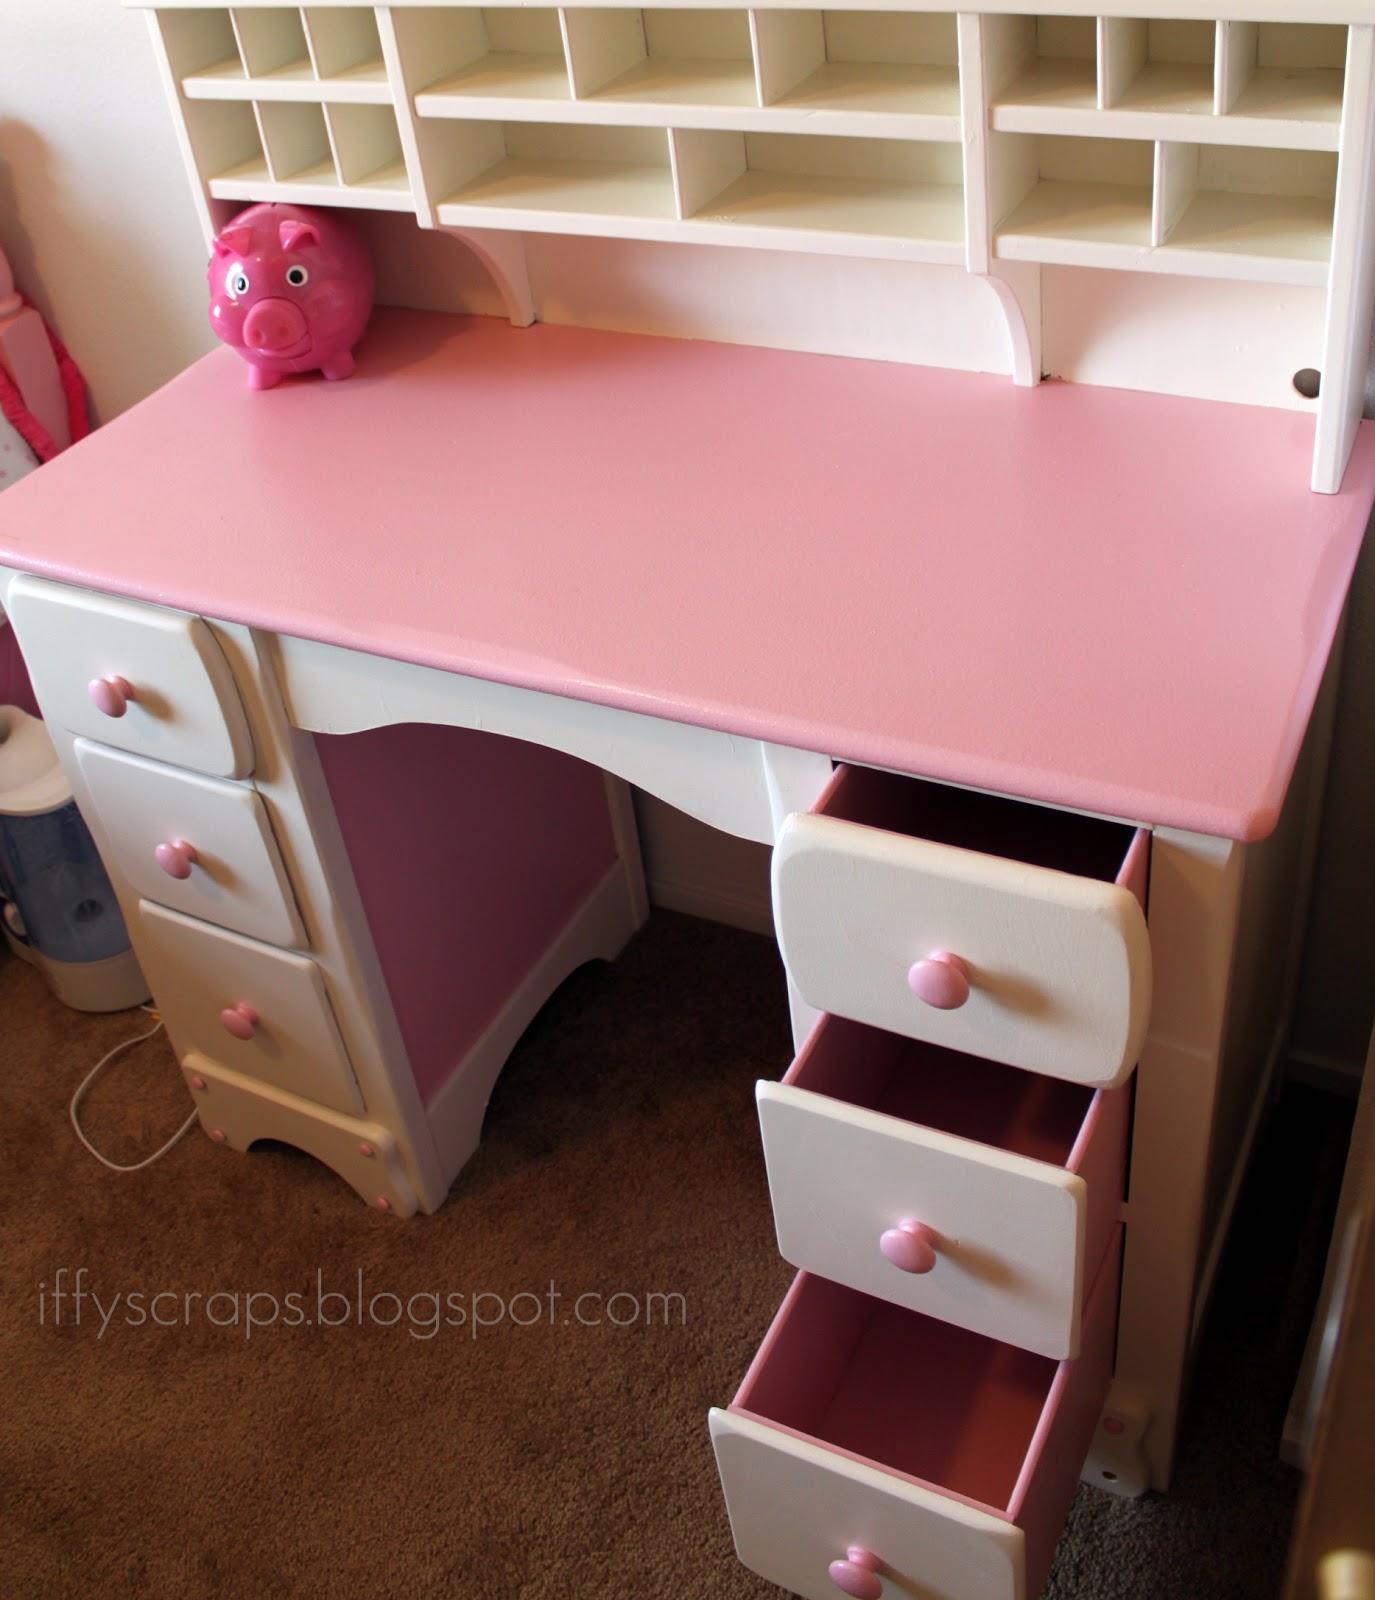 http://3.bp.blogspot.com/_zP2vE8PnWjY/TLSQwOVquNI/AAAAAAAAAfo/iQDq5-Zbx_4/s1600/Erynns+Desk+drawers.jpg